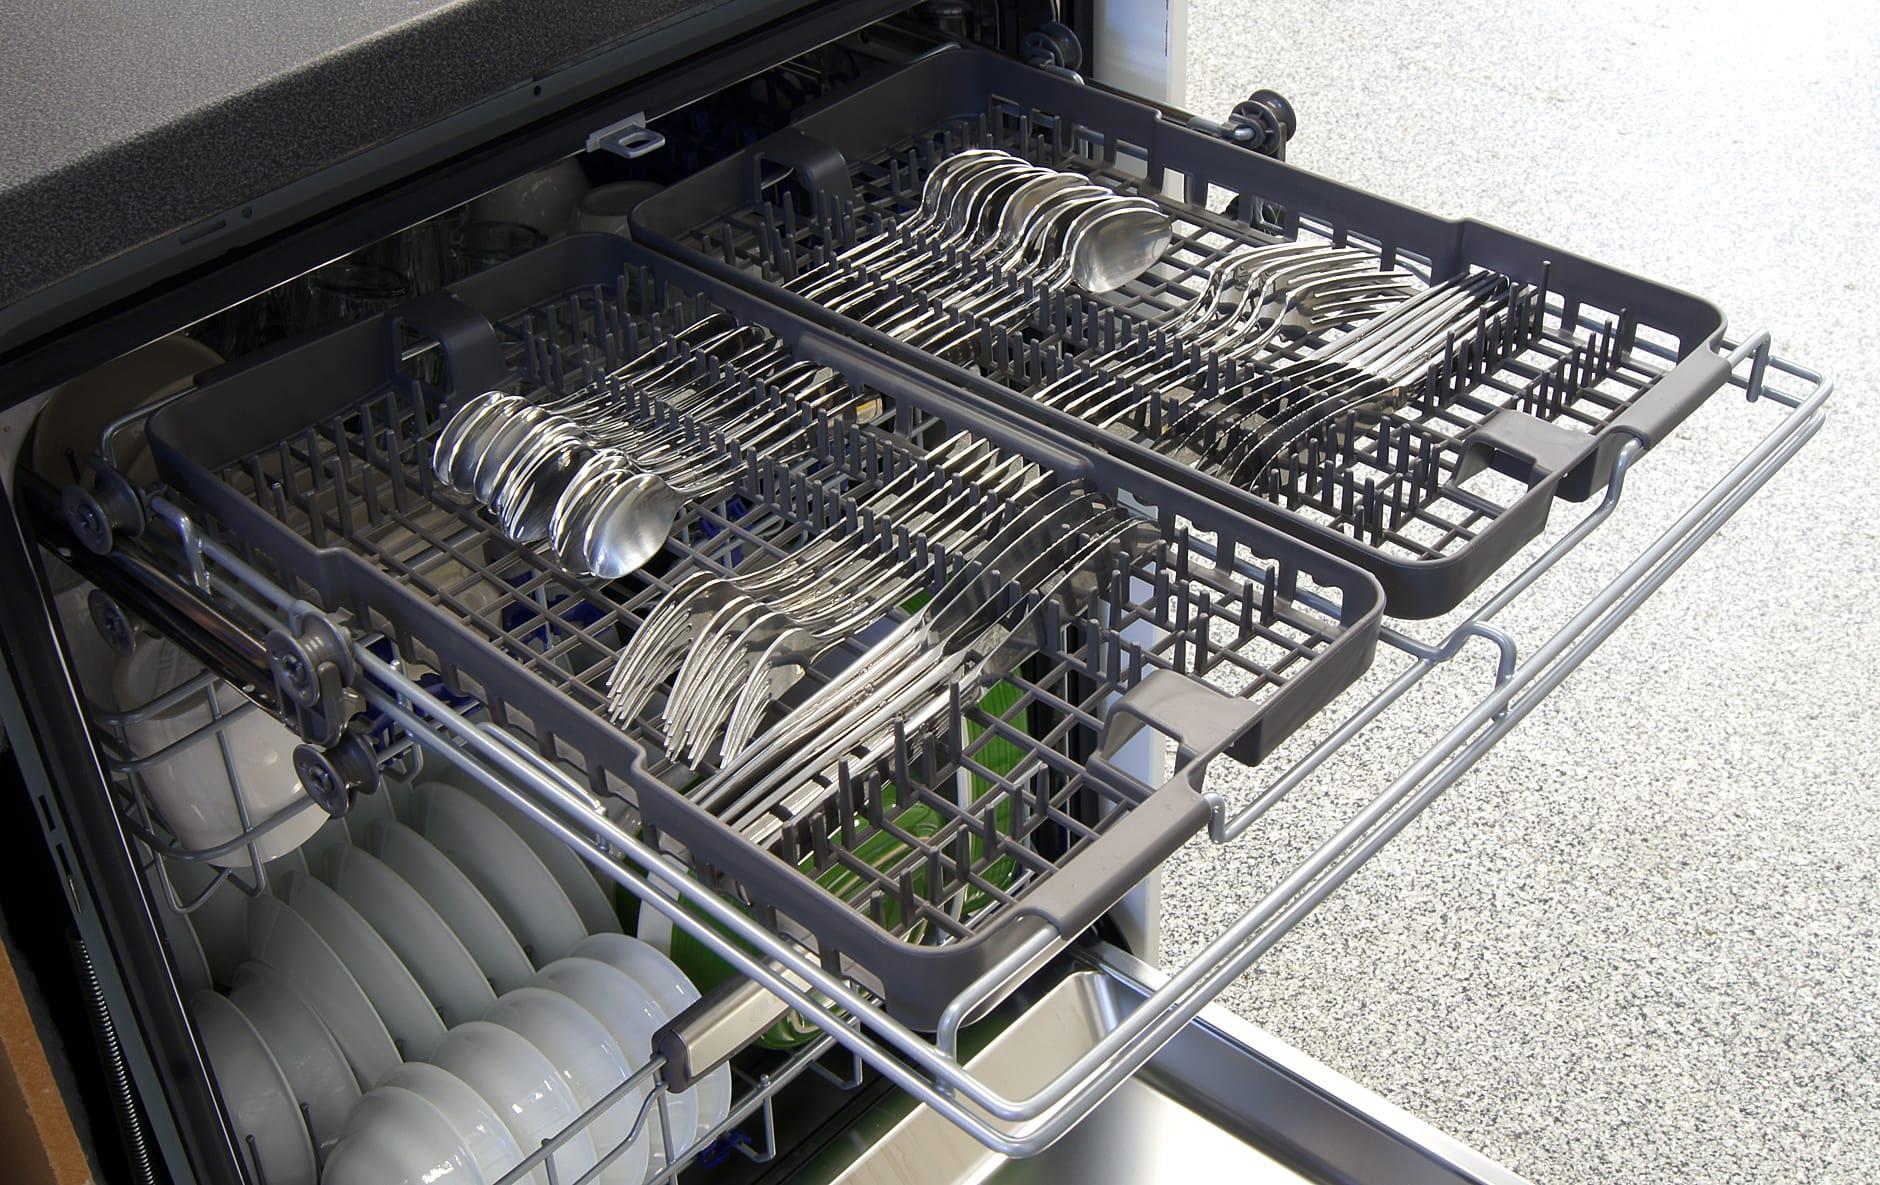 LG LDF8874ST third rack capacity